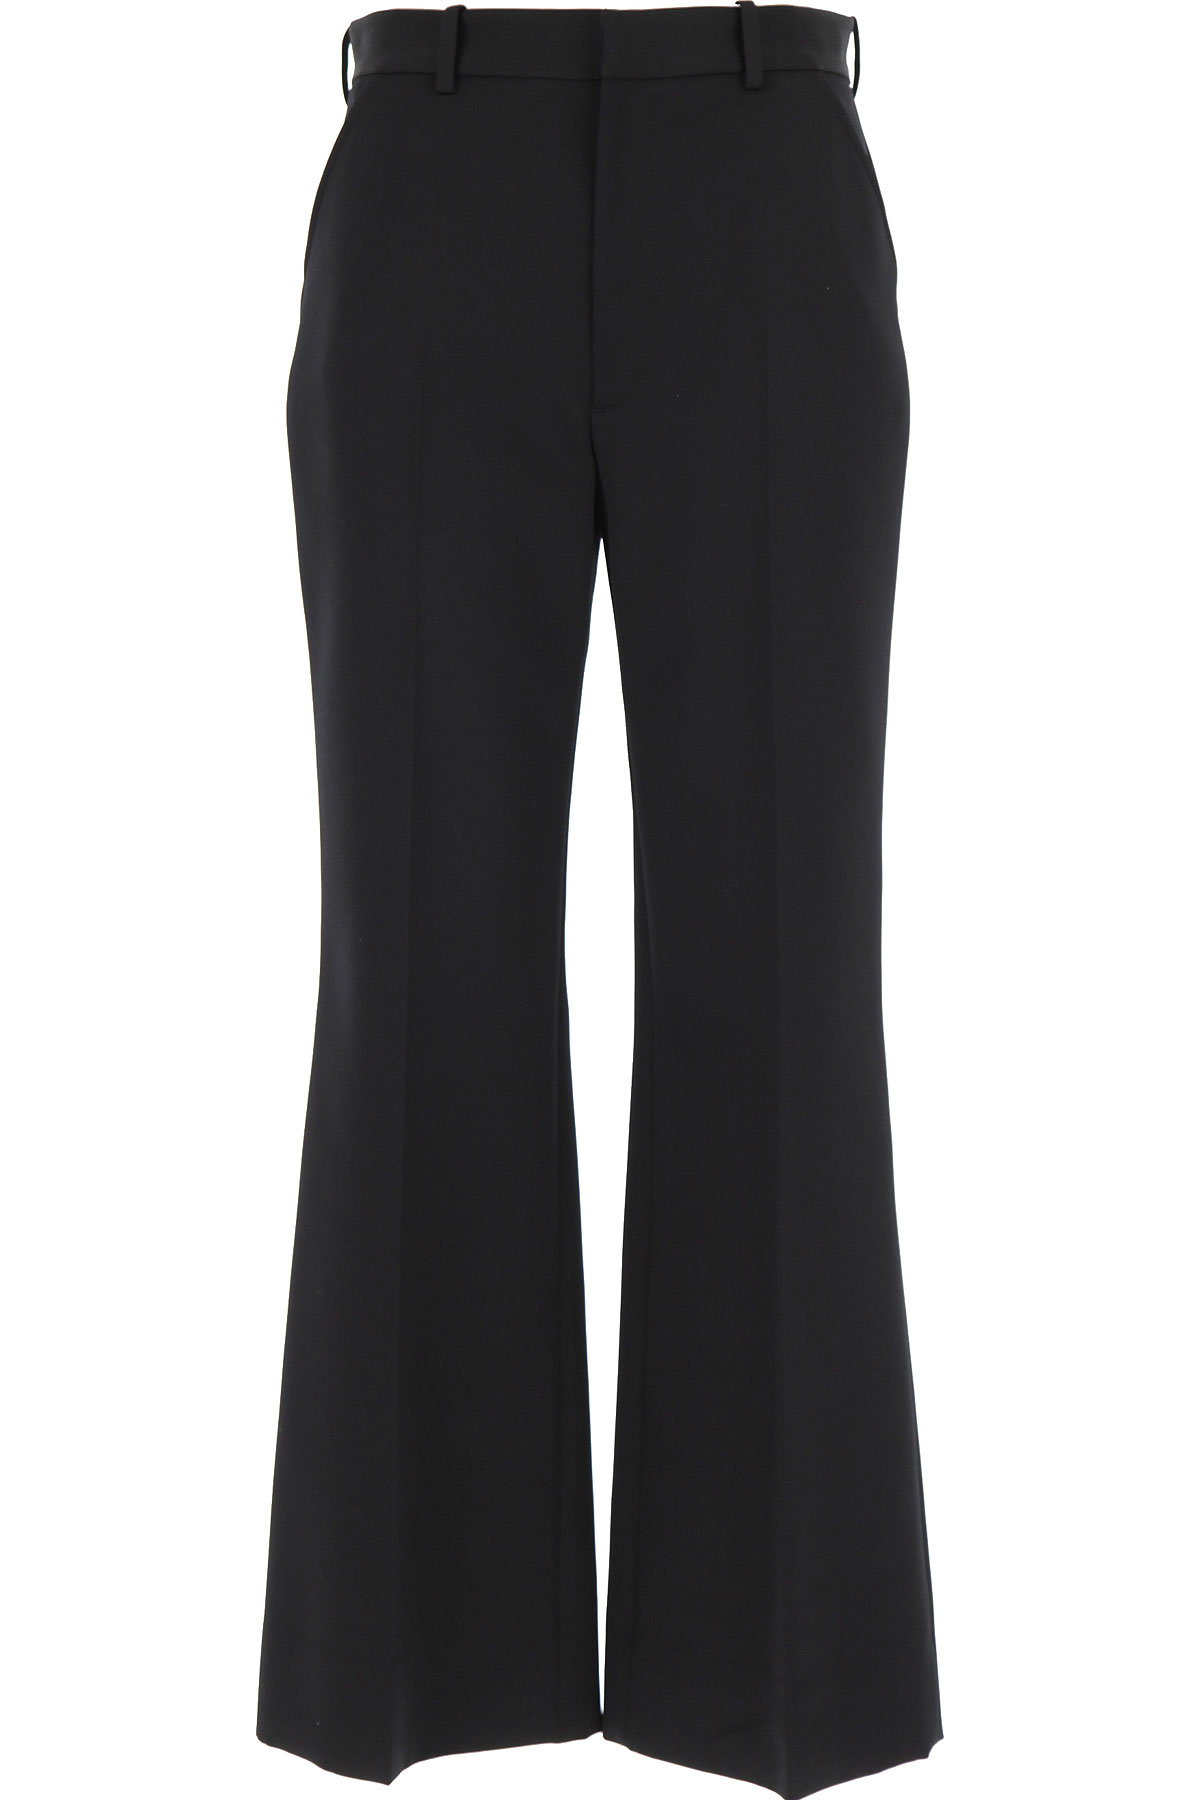 Maison Martin Margiela Pants for Women On Sale, Black, polyester, 2019, 26 4 8